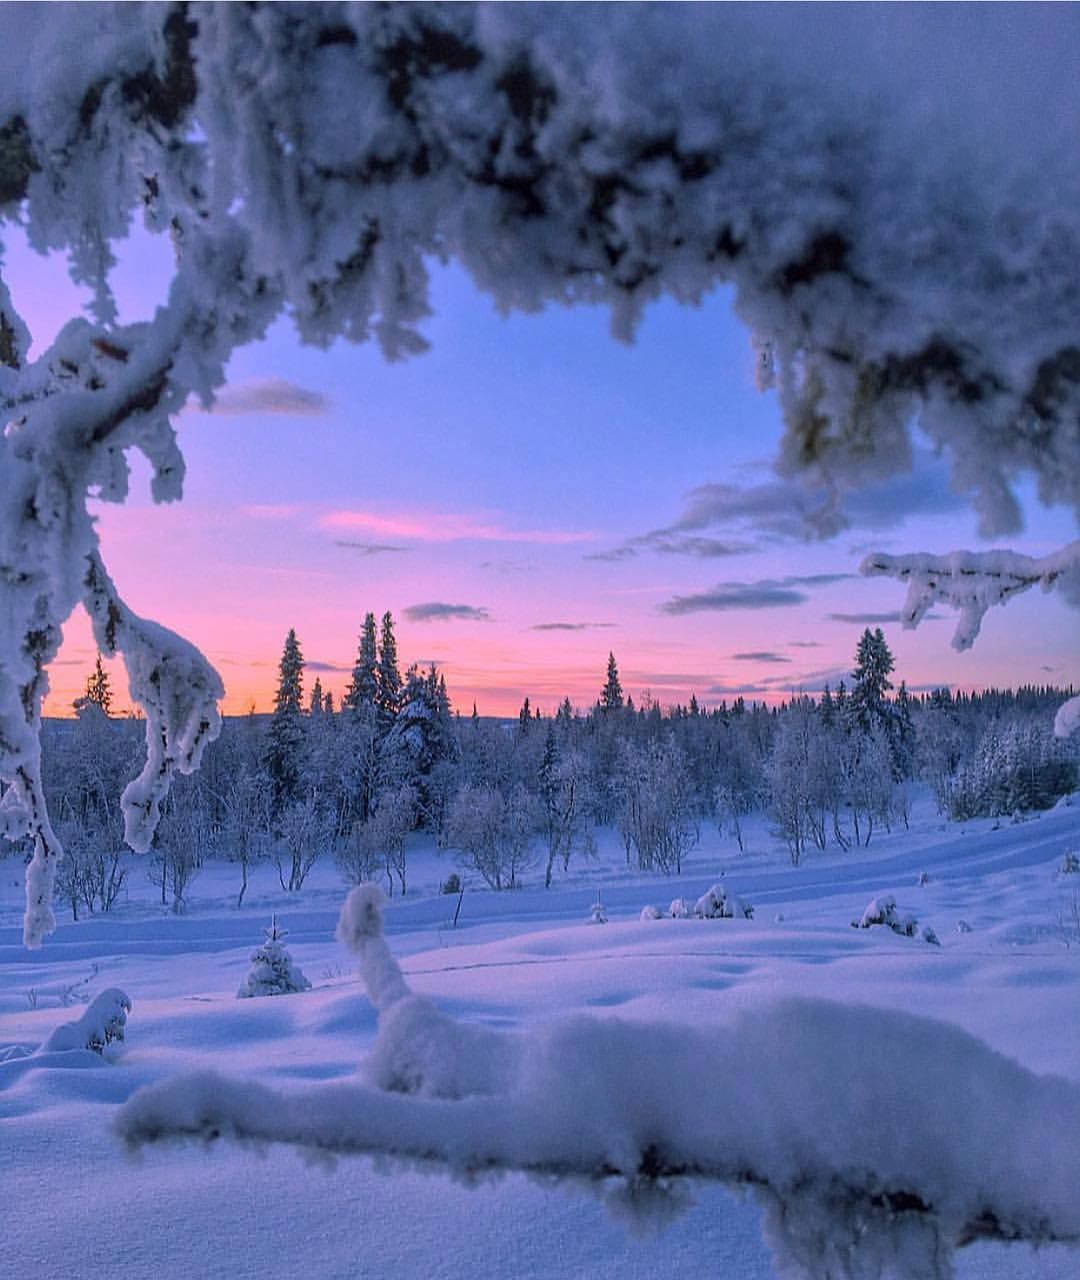 Sunset In The North Good Night Insta Captured By Jorgensenelisabeth Winter Landscape Winter Scenery Winter Pictures